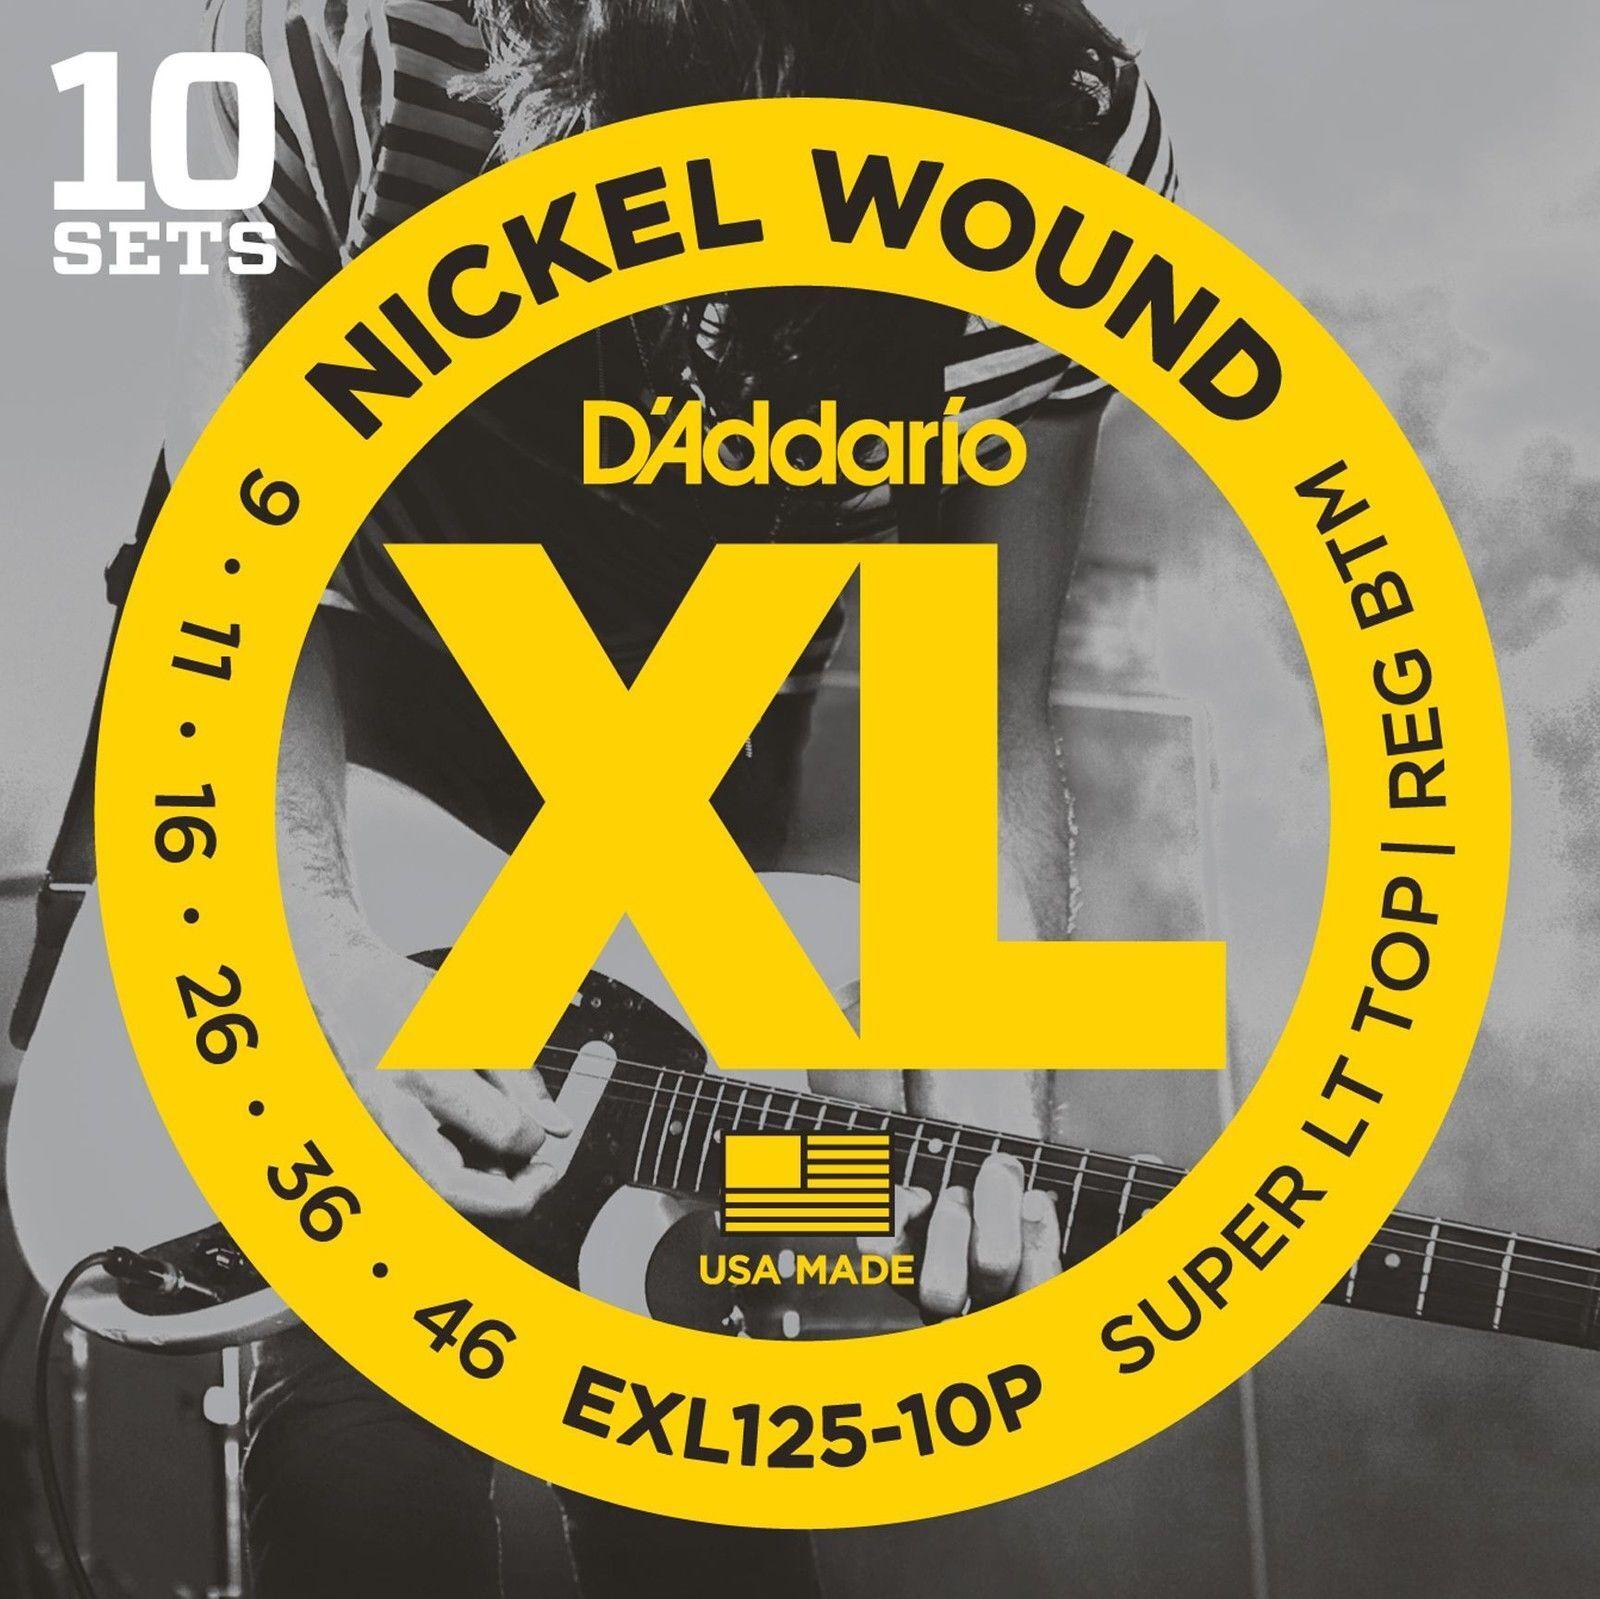 D'ADDARIO EXL125-10P SUPER LT/REG NICKEL WOUND ELECTRIC GUIT